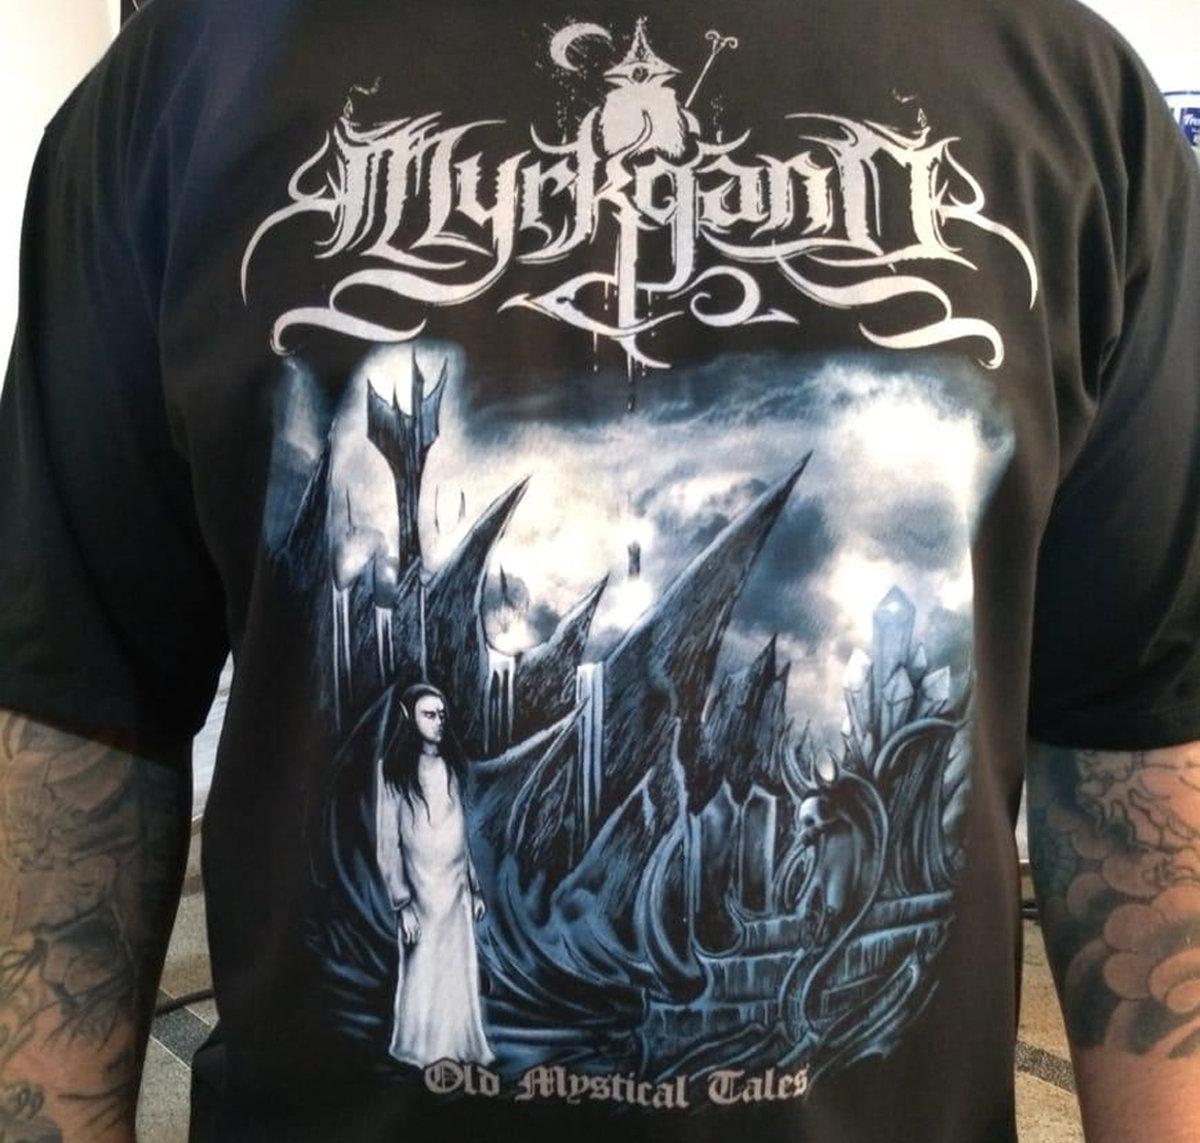 Old Mystical Tales | Myrkgand